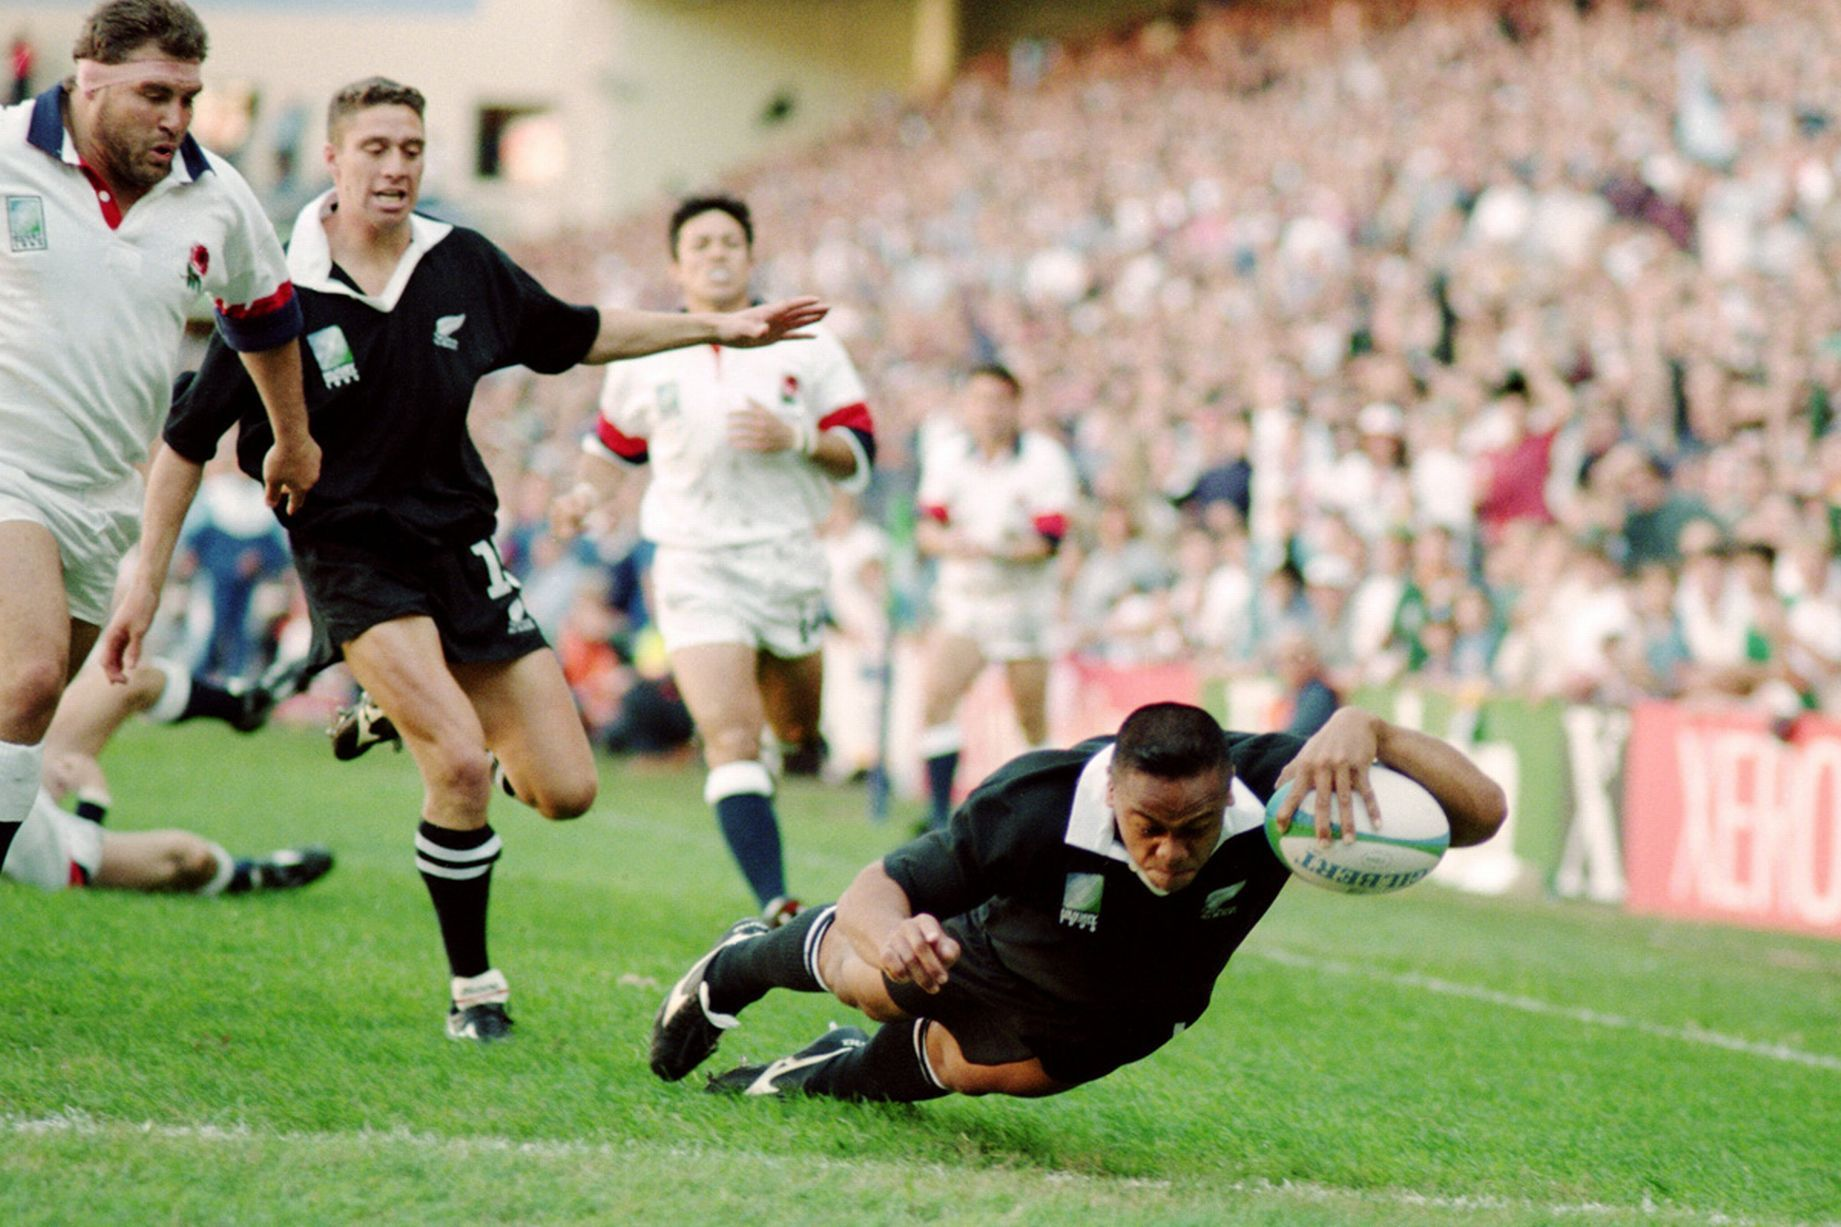 Tragic Jonah Lomu Was Amazing Giant Of A Man Says David Beckham Jonah Lomu Rugby World Cup All Blacks